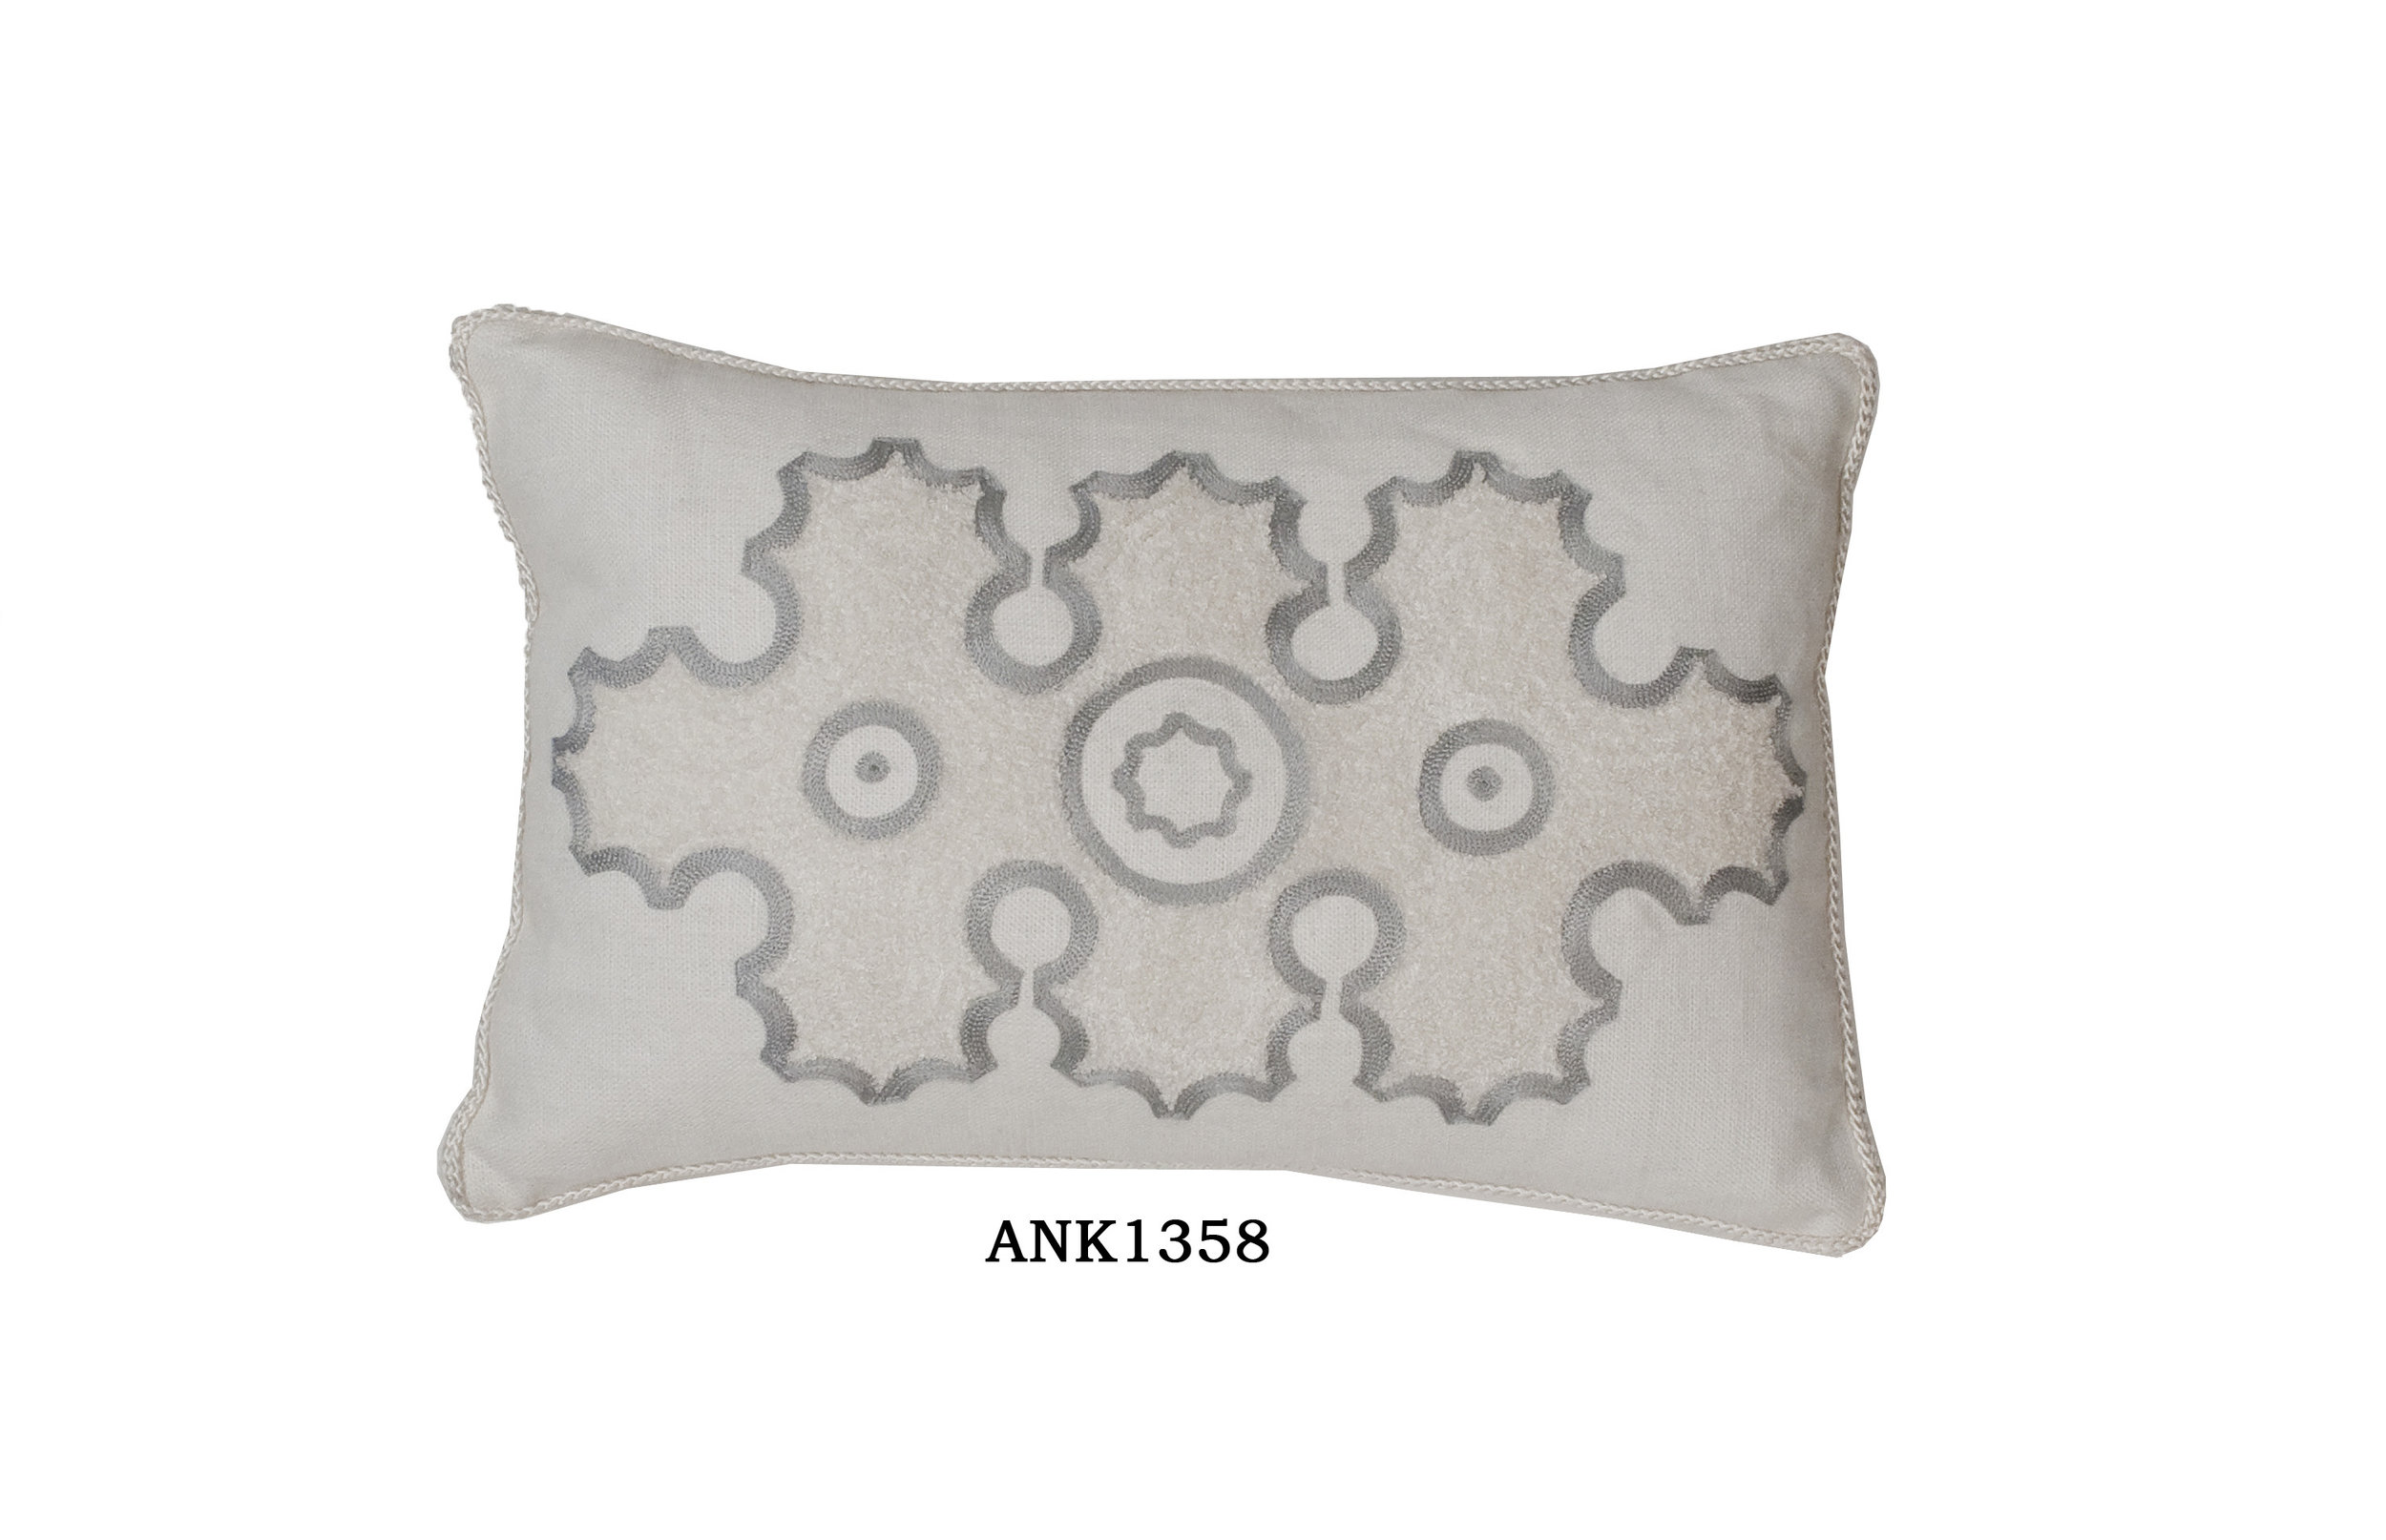 ank1358 copy.jpg